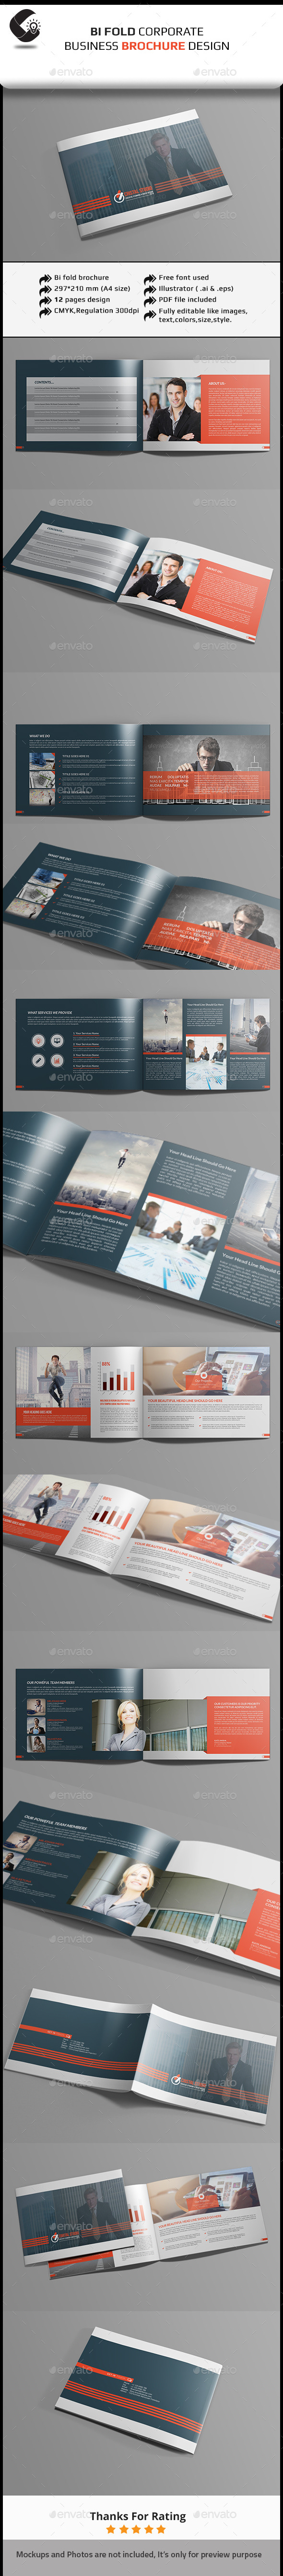 GraphicRiver Corporate Brochure Template 11251773